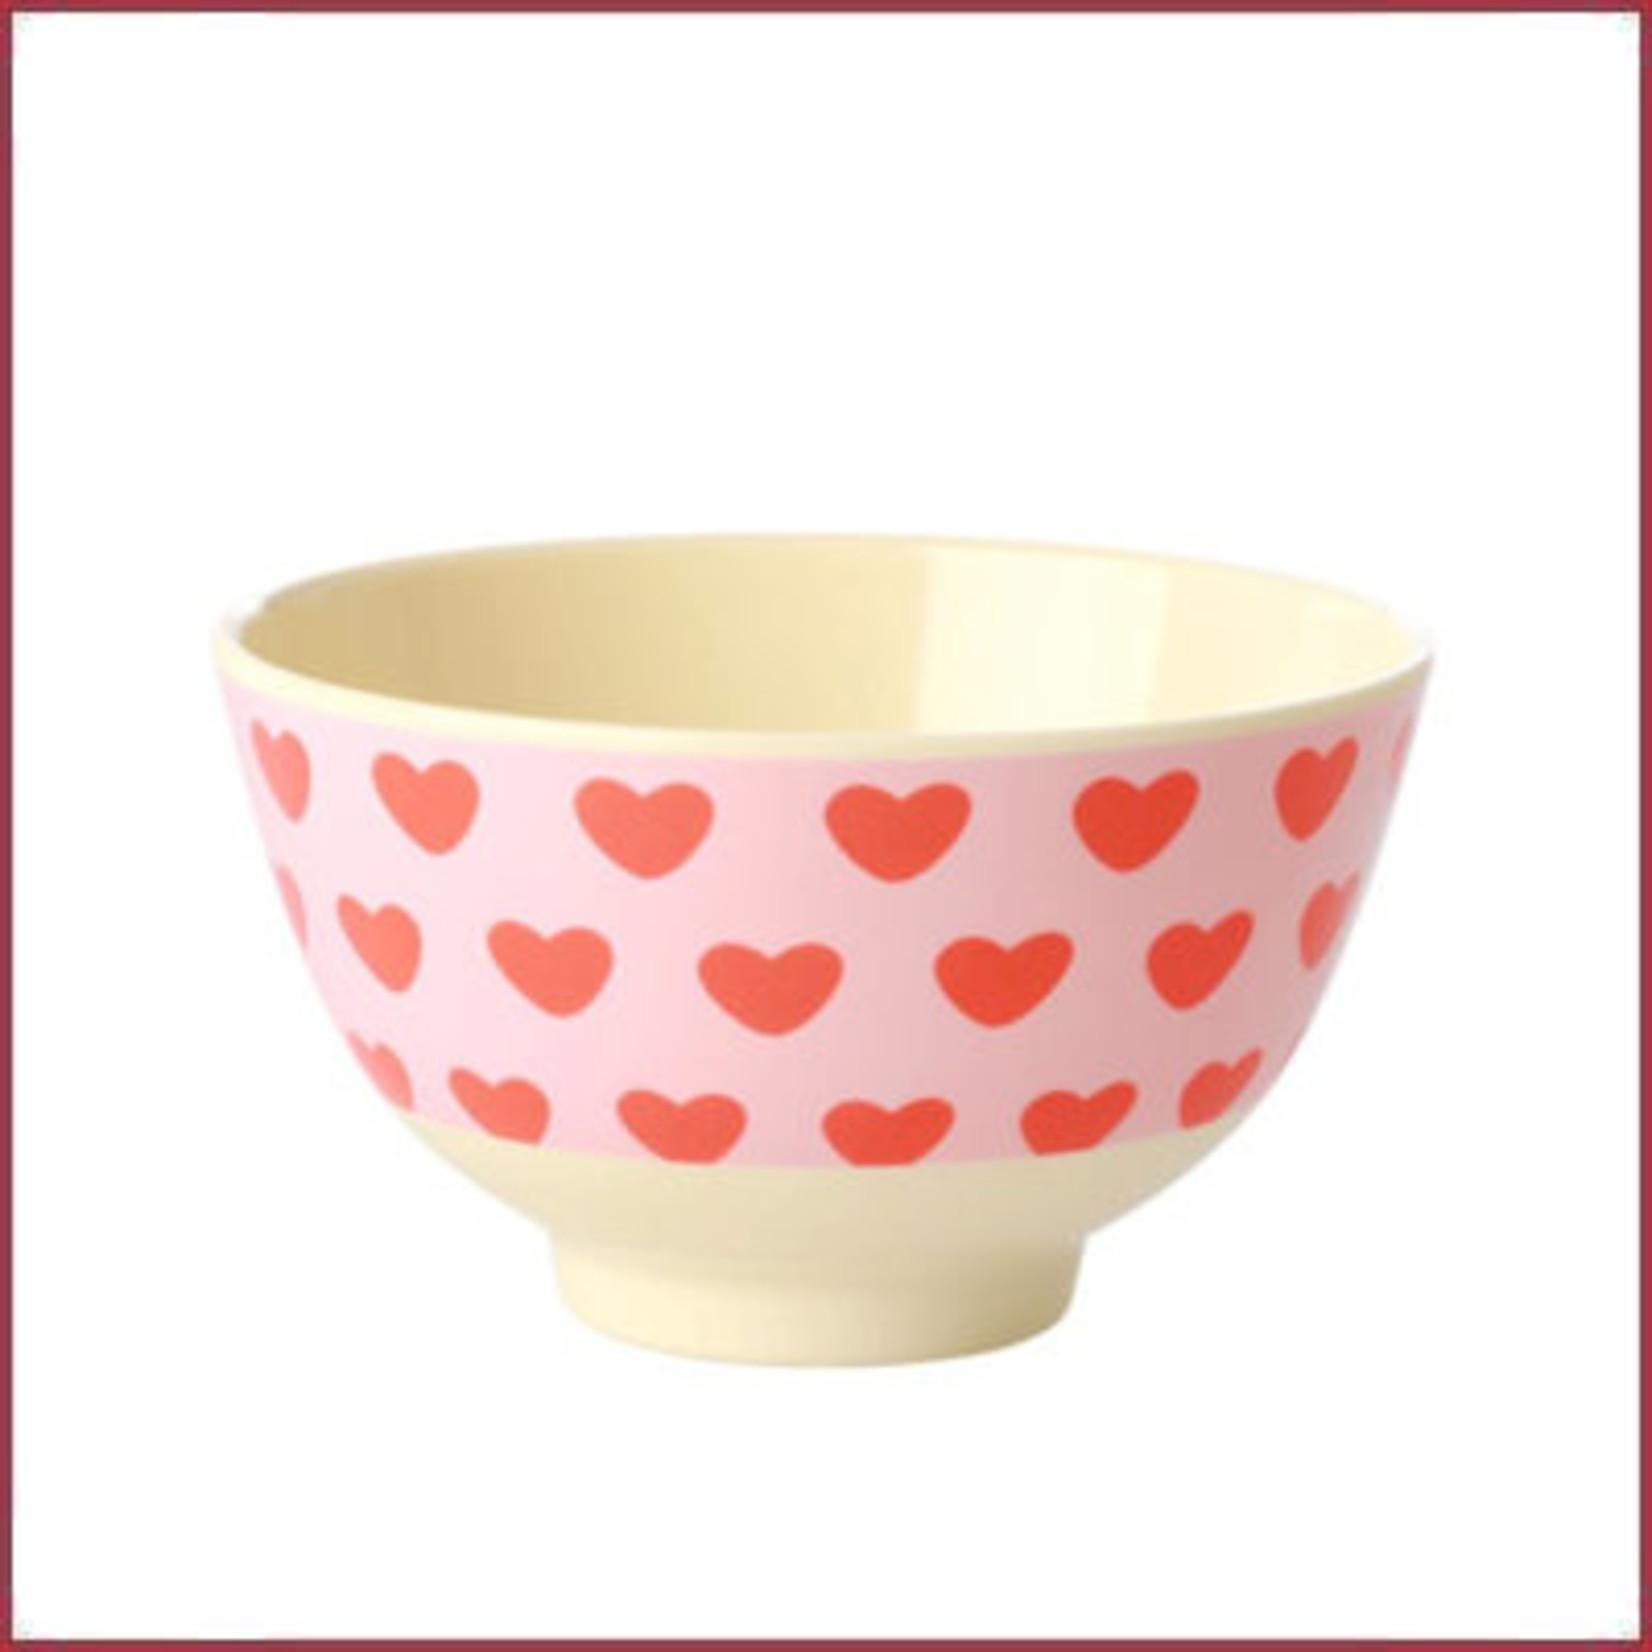 Rice Rice Bowl Small - Sweet Heart Print